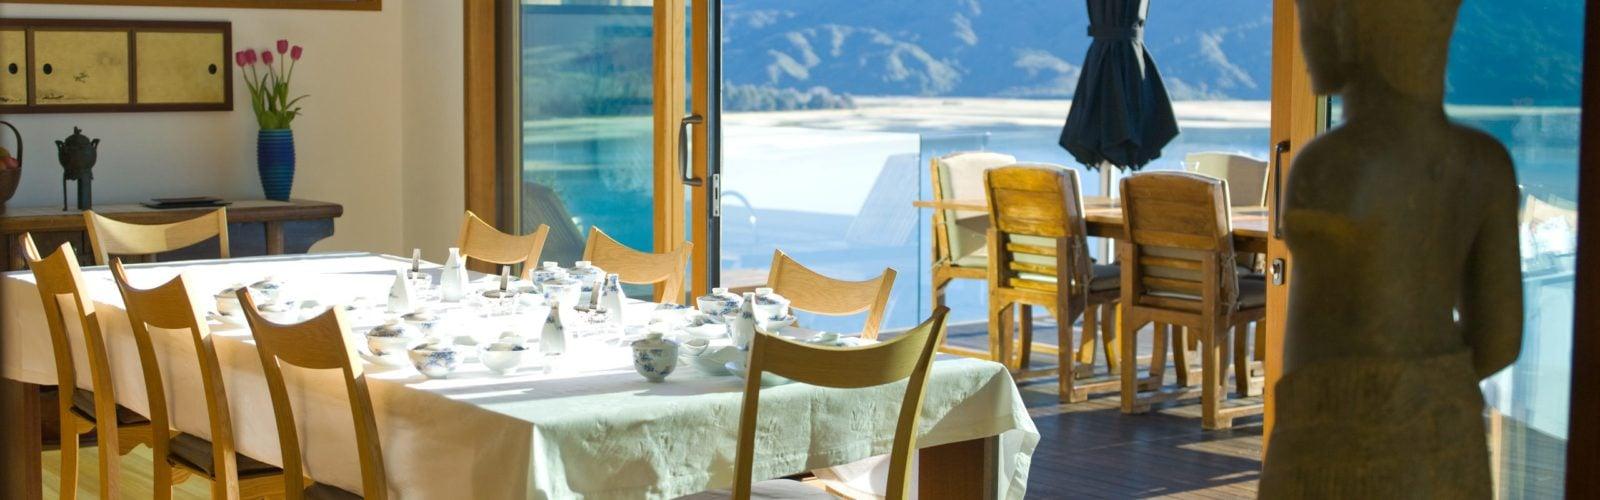 Split Apple Retreat luxury retreat lodge accommodation near Nelsons Abel Tasman National Park